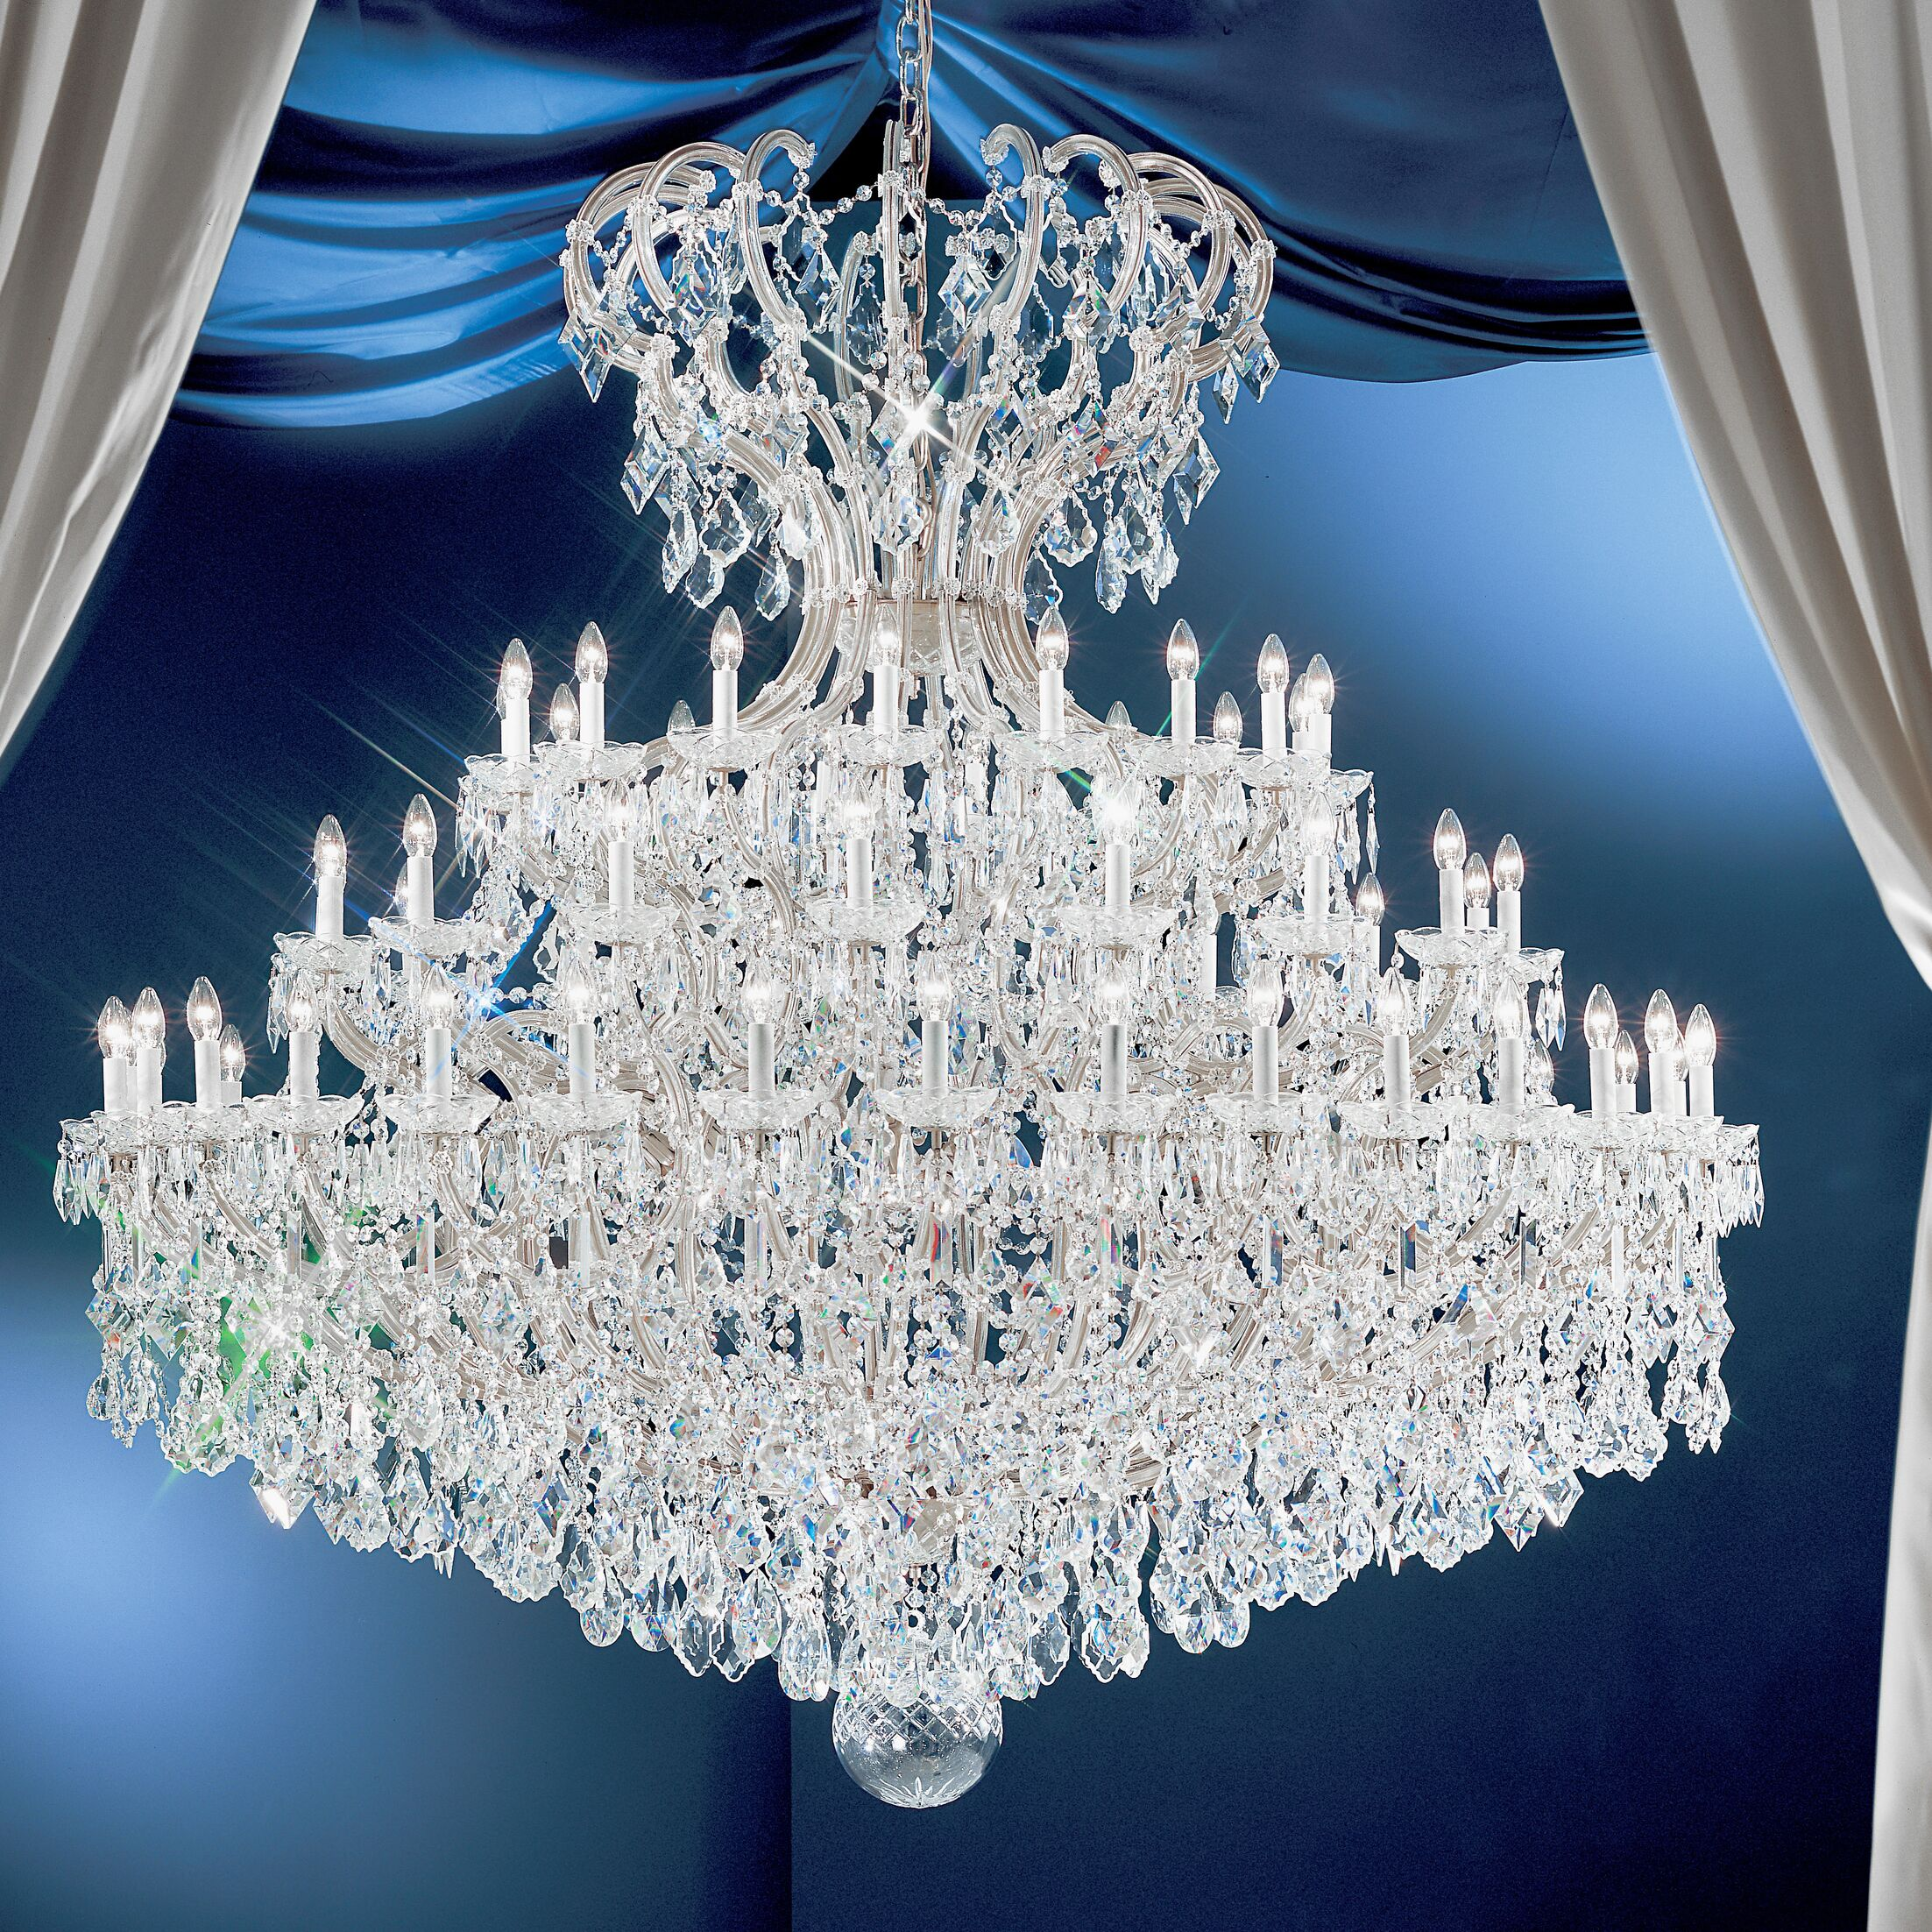 Maria Thersea 72-Light Empire Chandelier Crystal Type: Swarovski Spectra, Finish: Olde World Gold